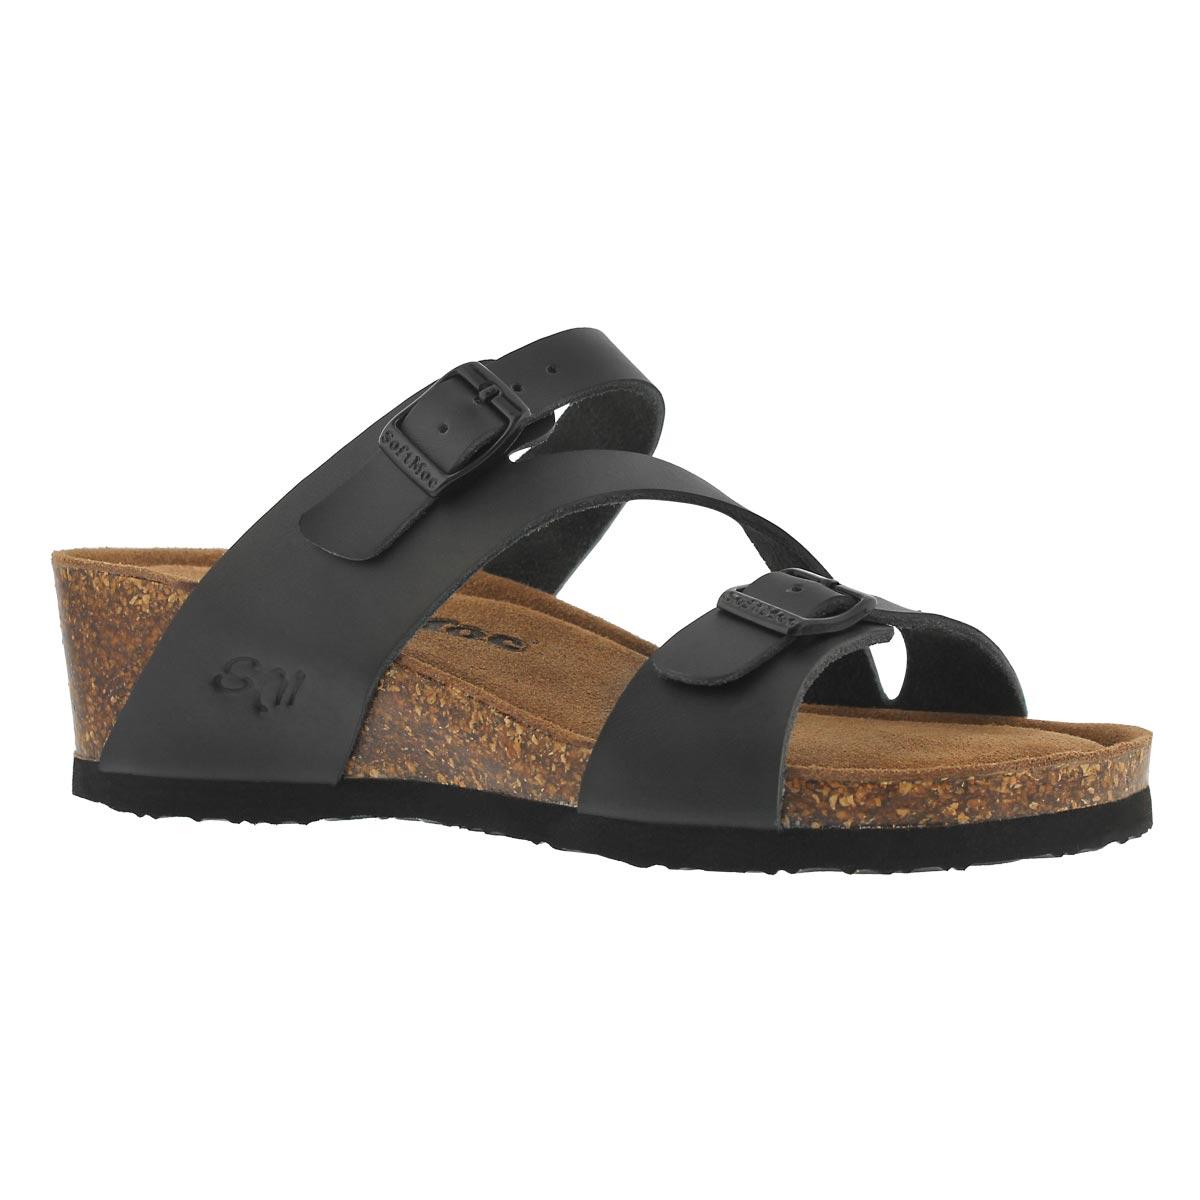 Women's ALTHEA 5 black memory foam wedge sandals